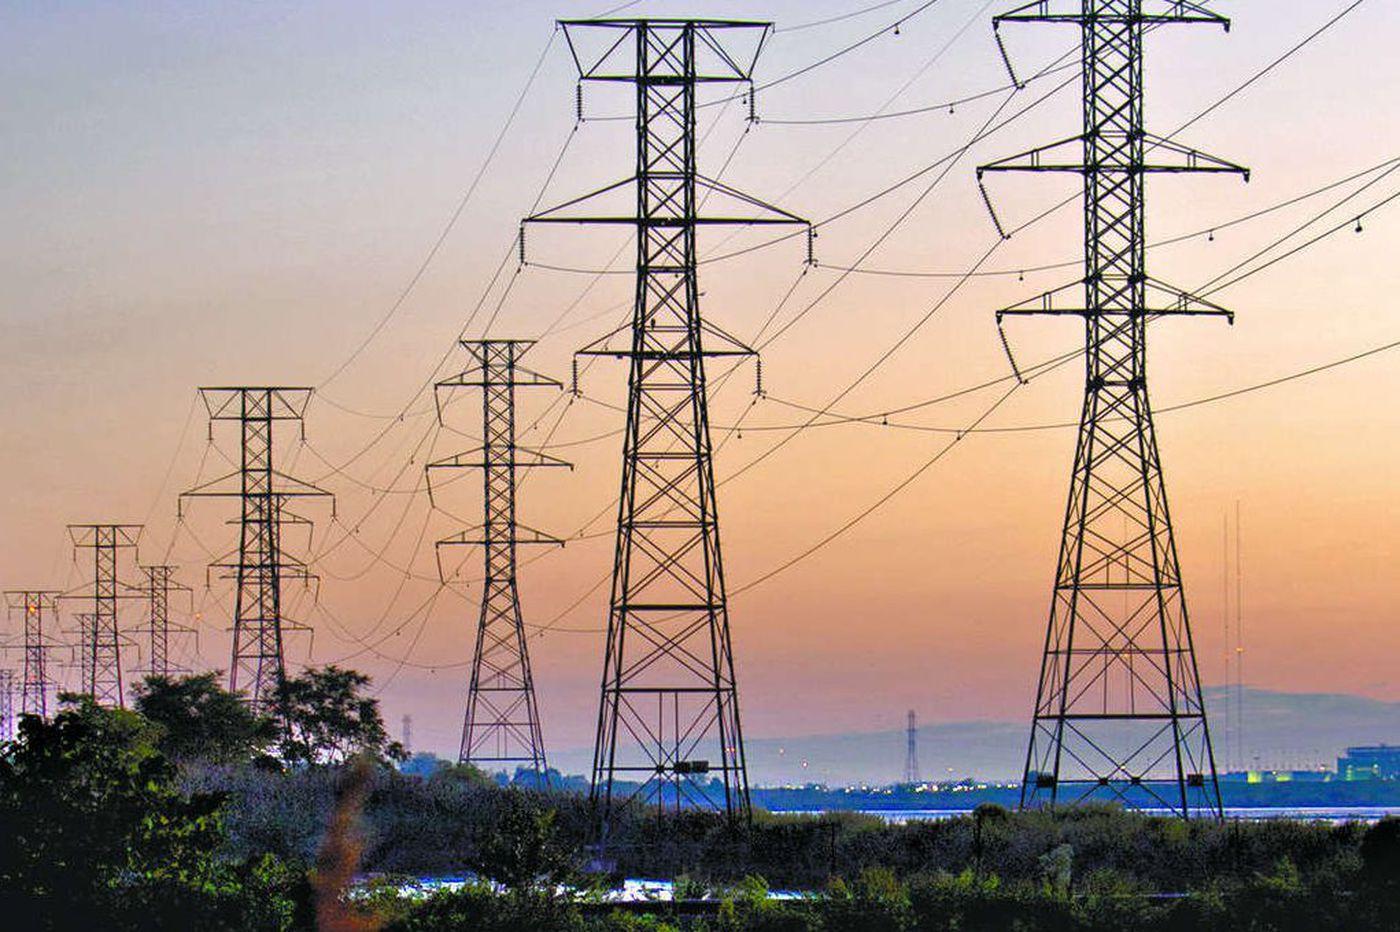 N.J. electric bills will decrease on June 1